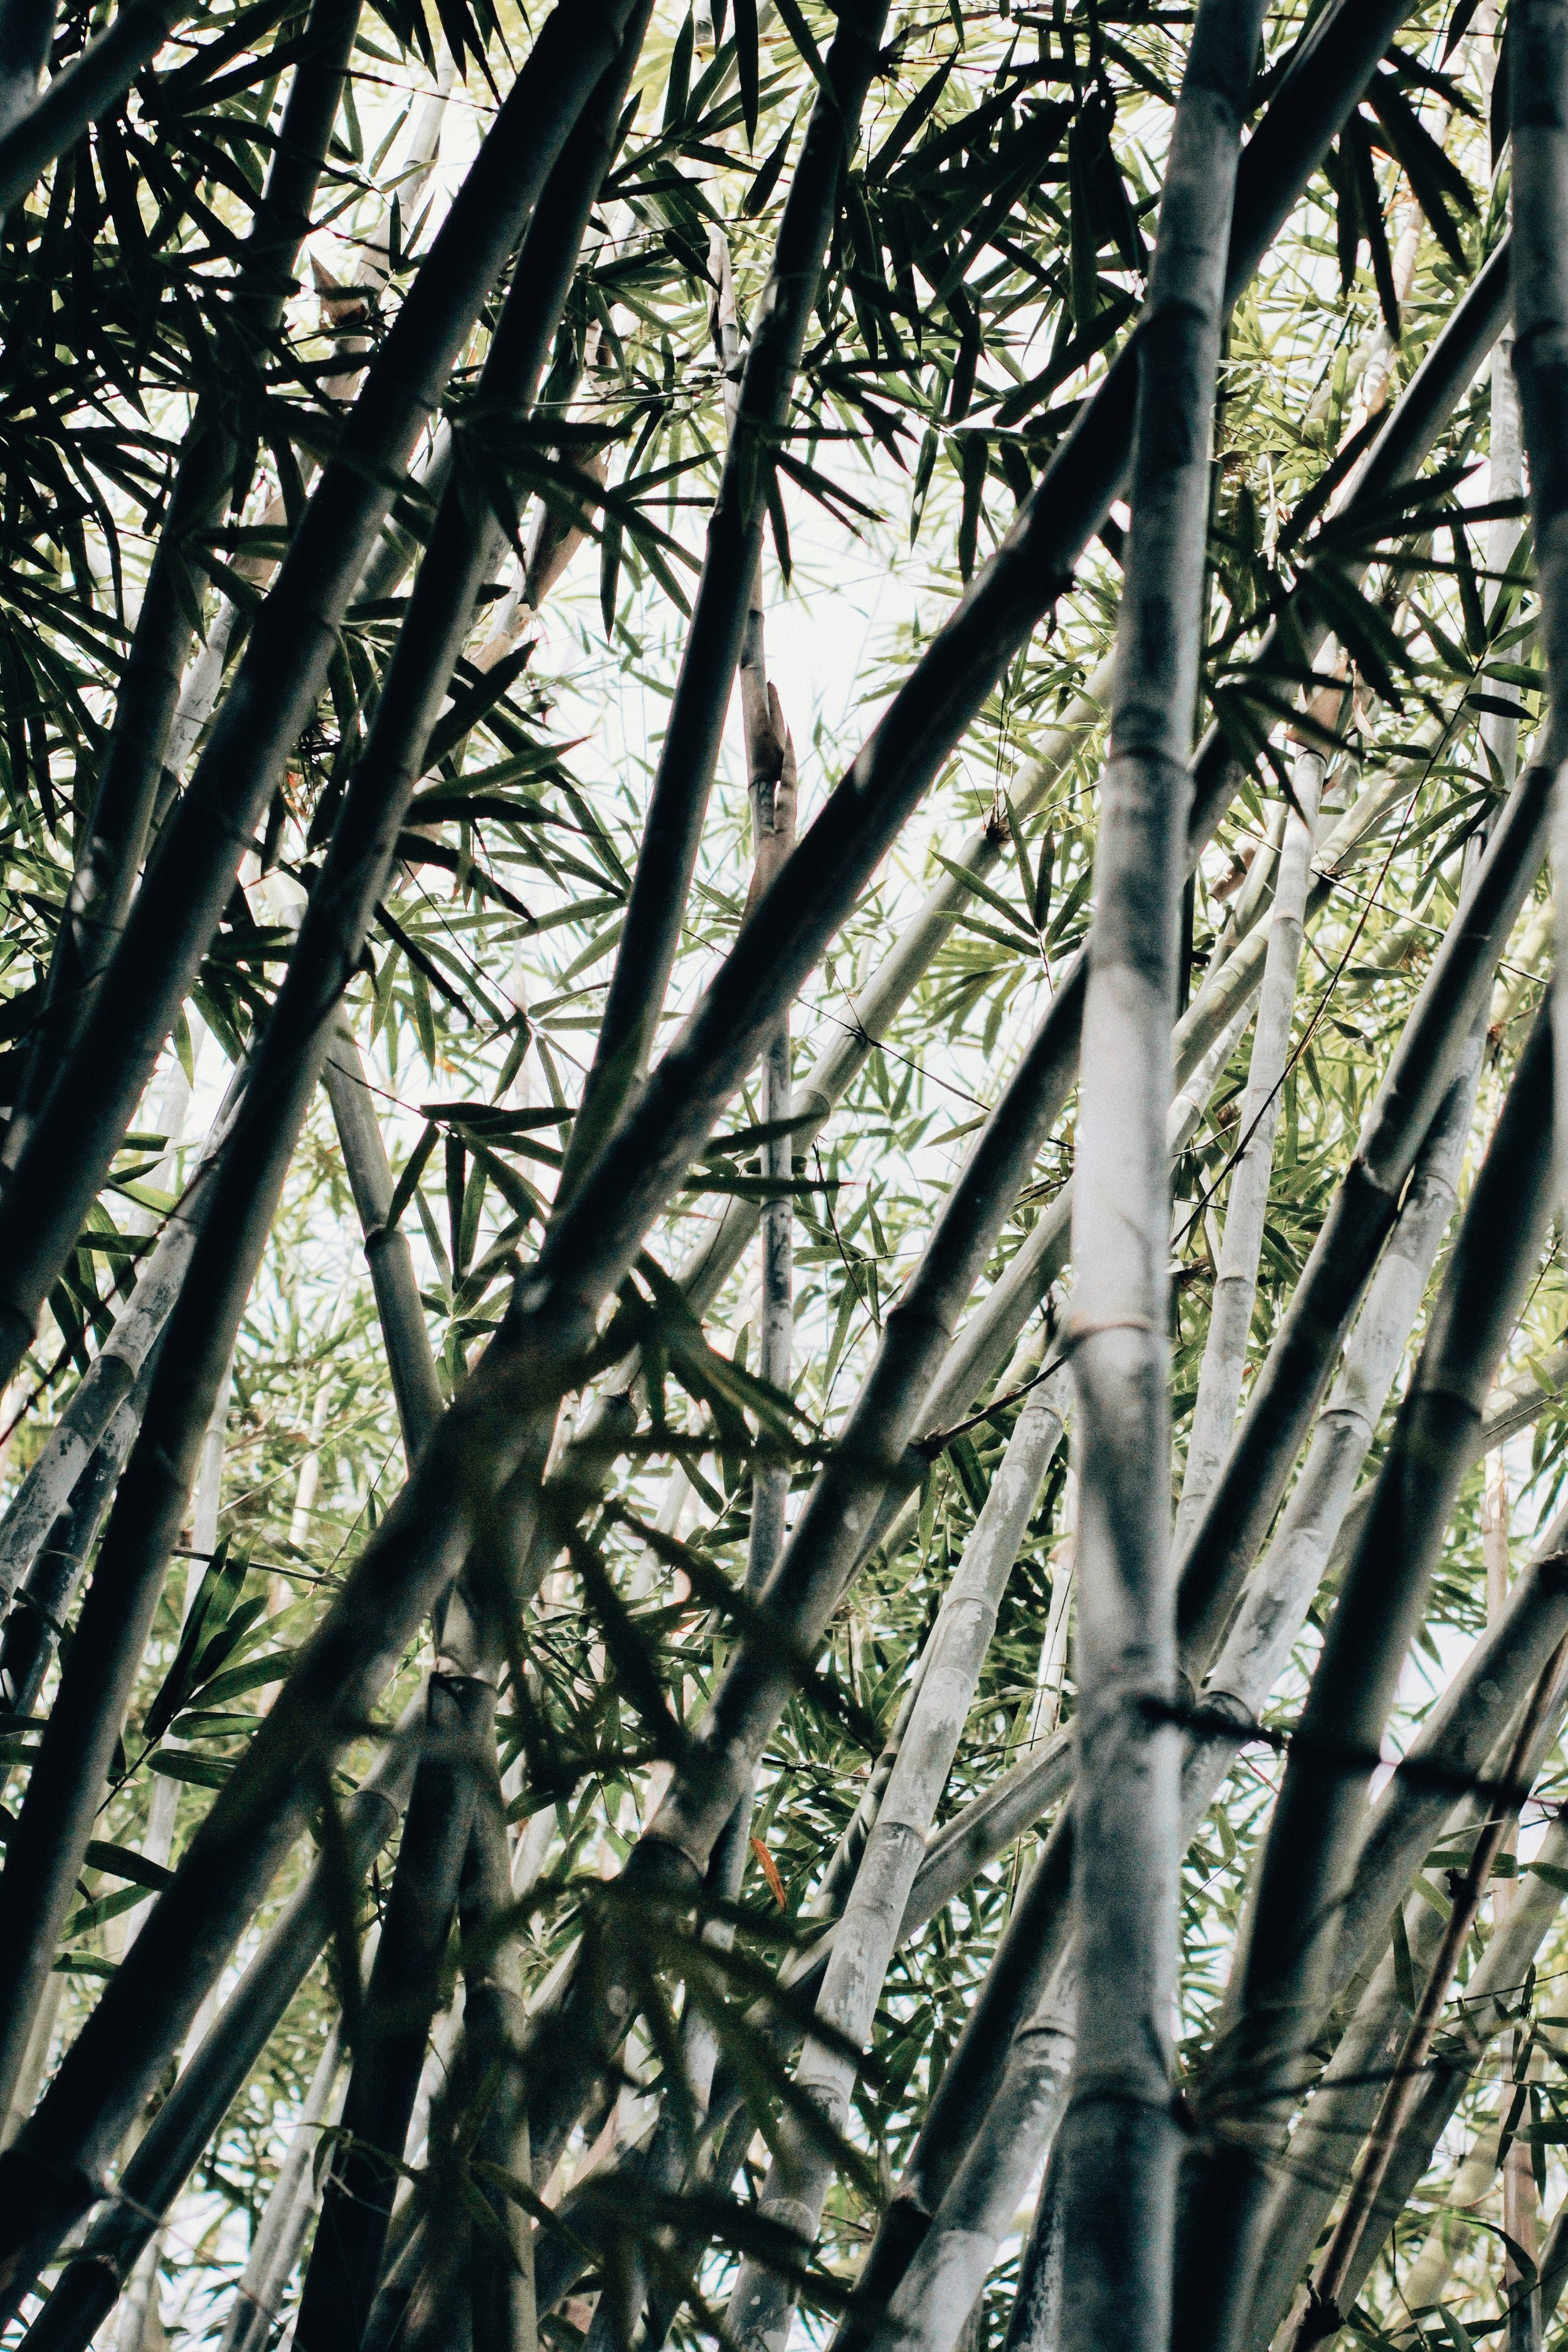 bamboo-grass-plant-2534507.jpg